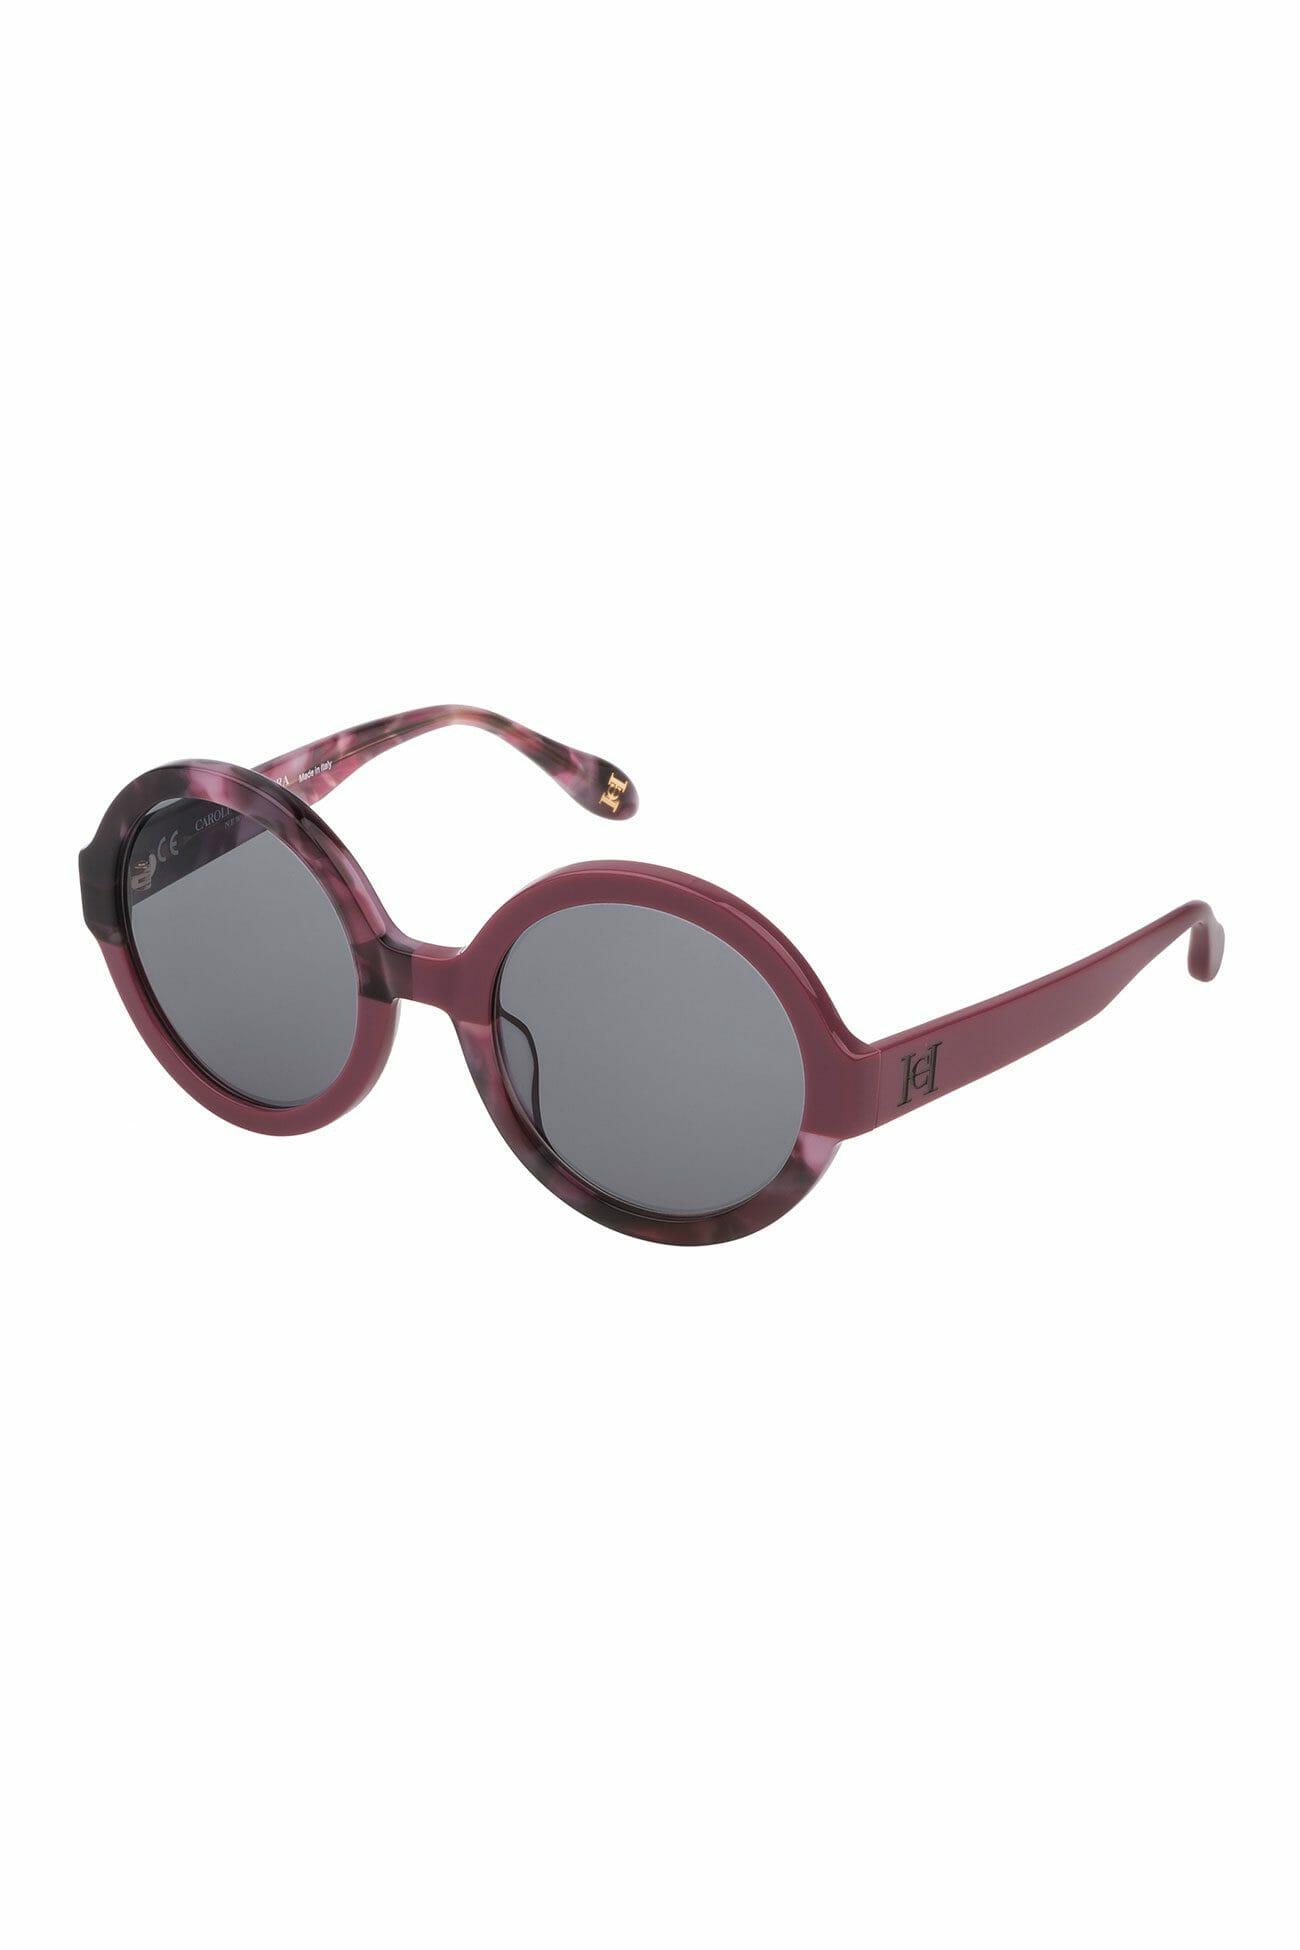 CHNY-Carolina-Herrera-New-York-Eyewear-Women